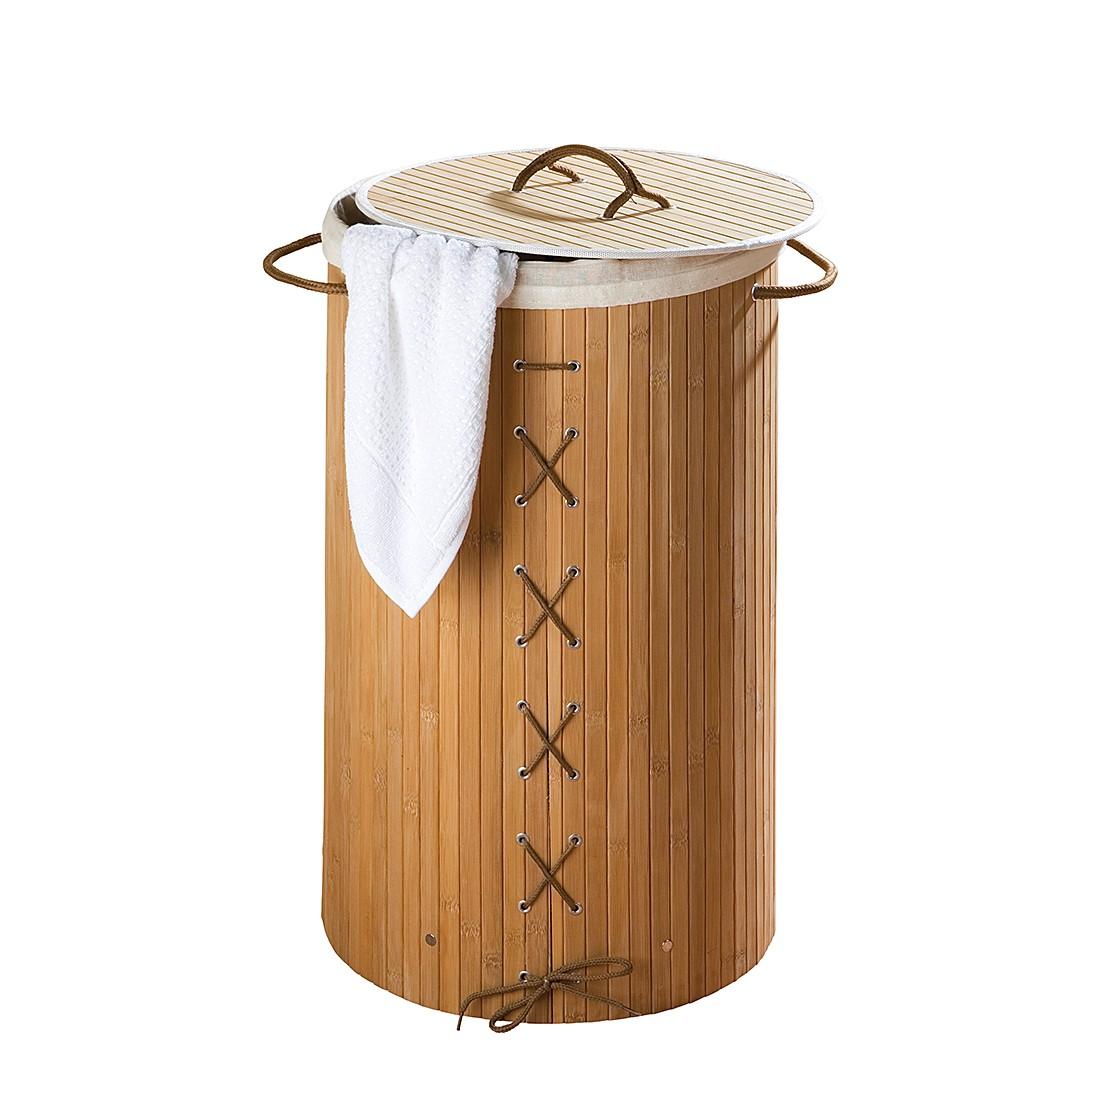 Wäschetruhe Bamboo - Natur, Wenko